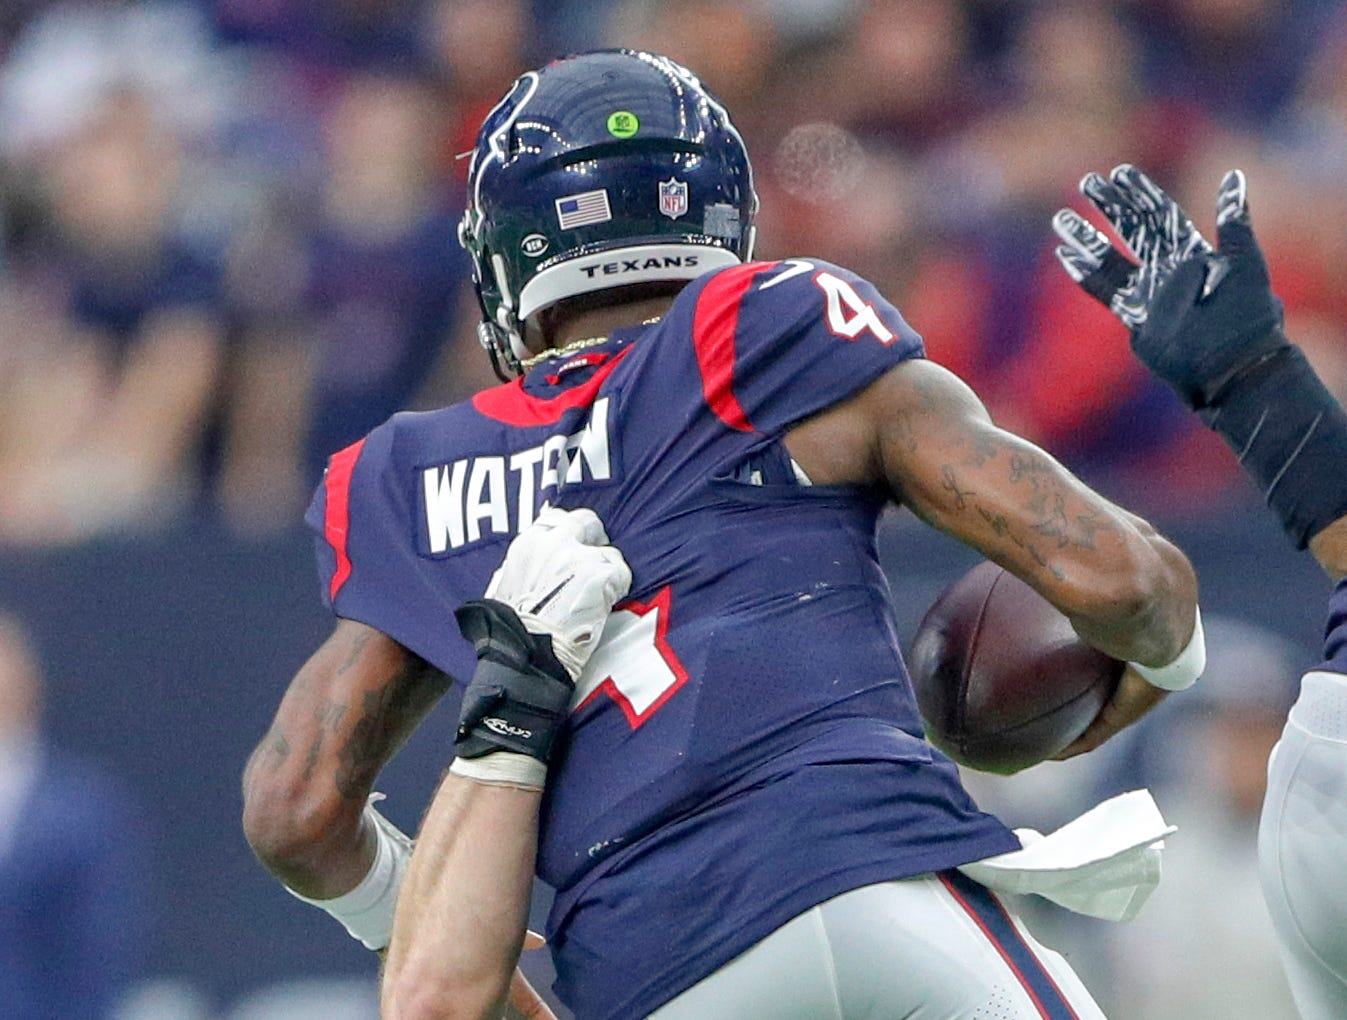 Indianapolis Colts defensive end Margus Hunt (92) sacks Houston Texans quarterback Deshaun Watson (4) in the fourth quarter at NRG Stadium in Houston on Sunday, Dec. 9, 2018.